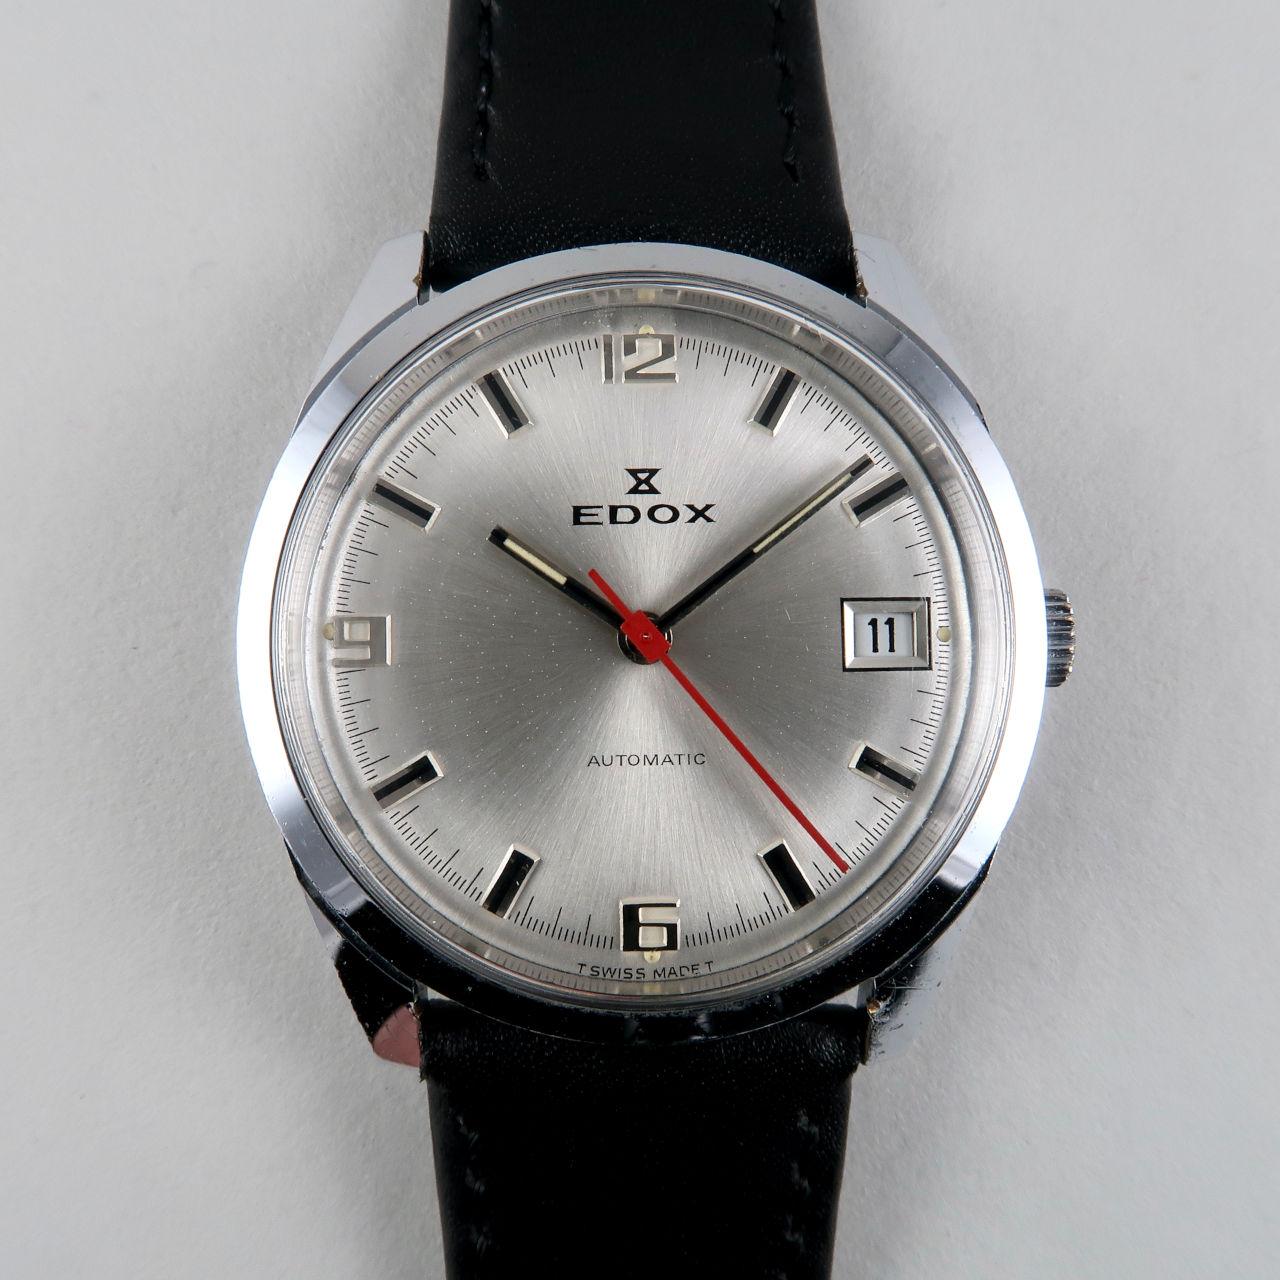 Edox Cal. AS 1903 circa 1975 | chrome & steel vintage wristwatch